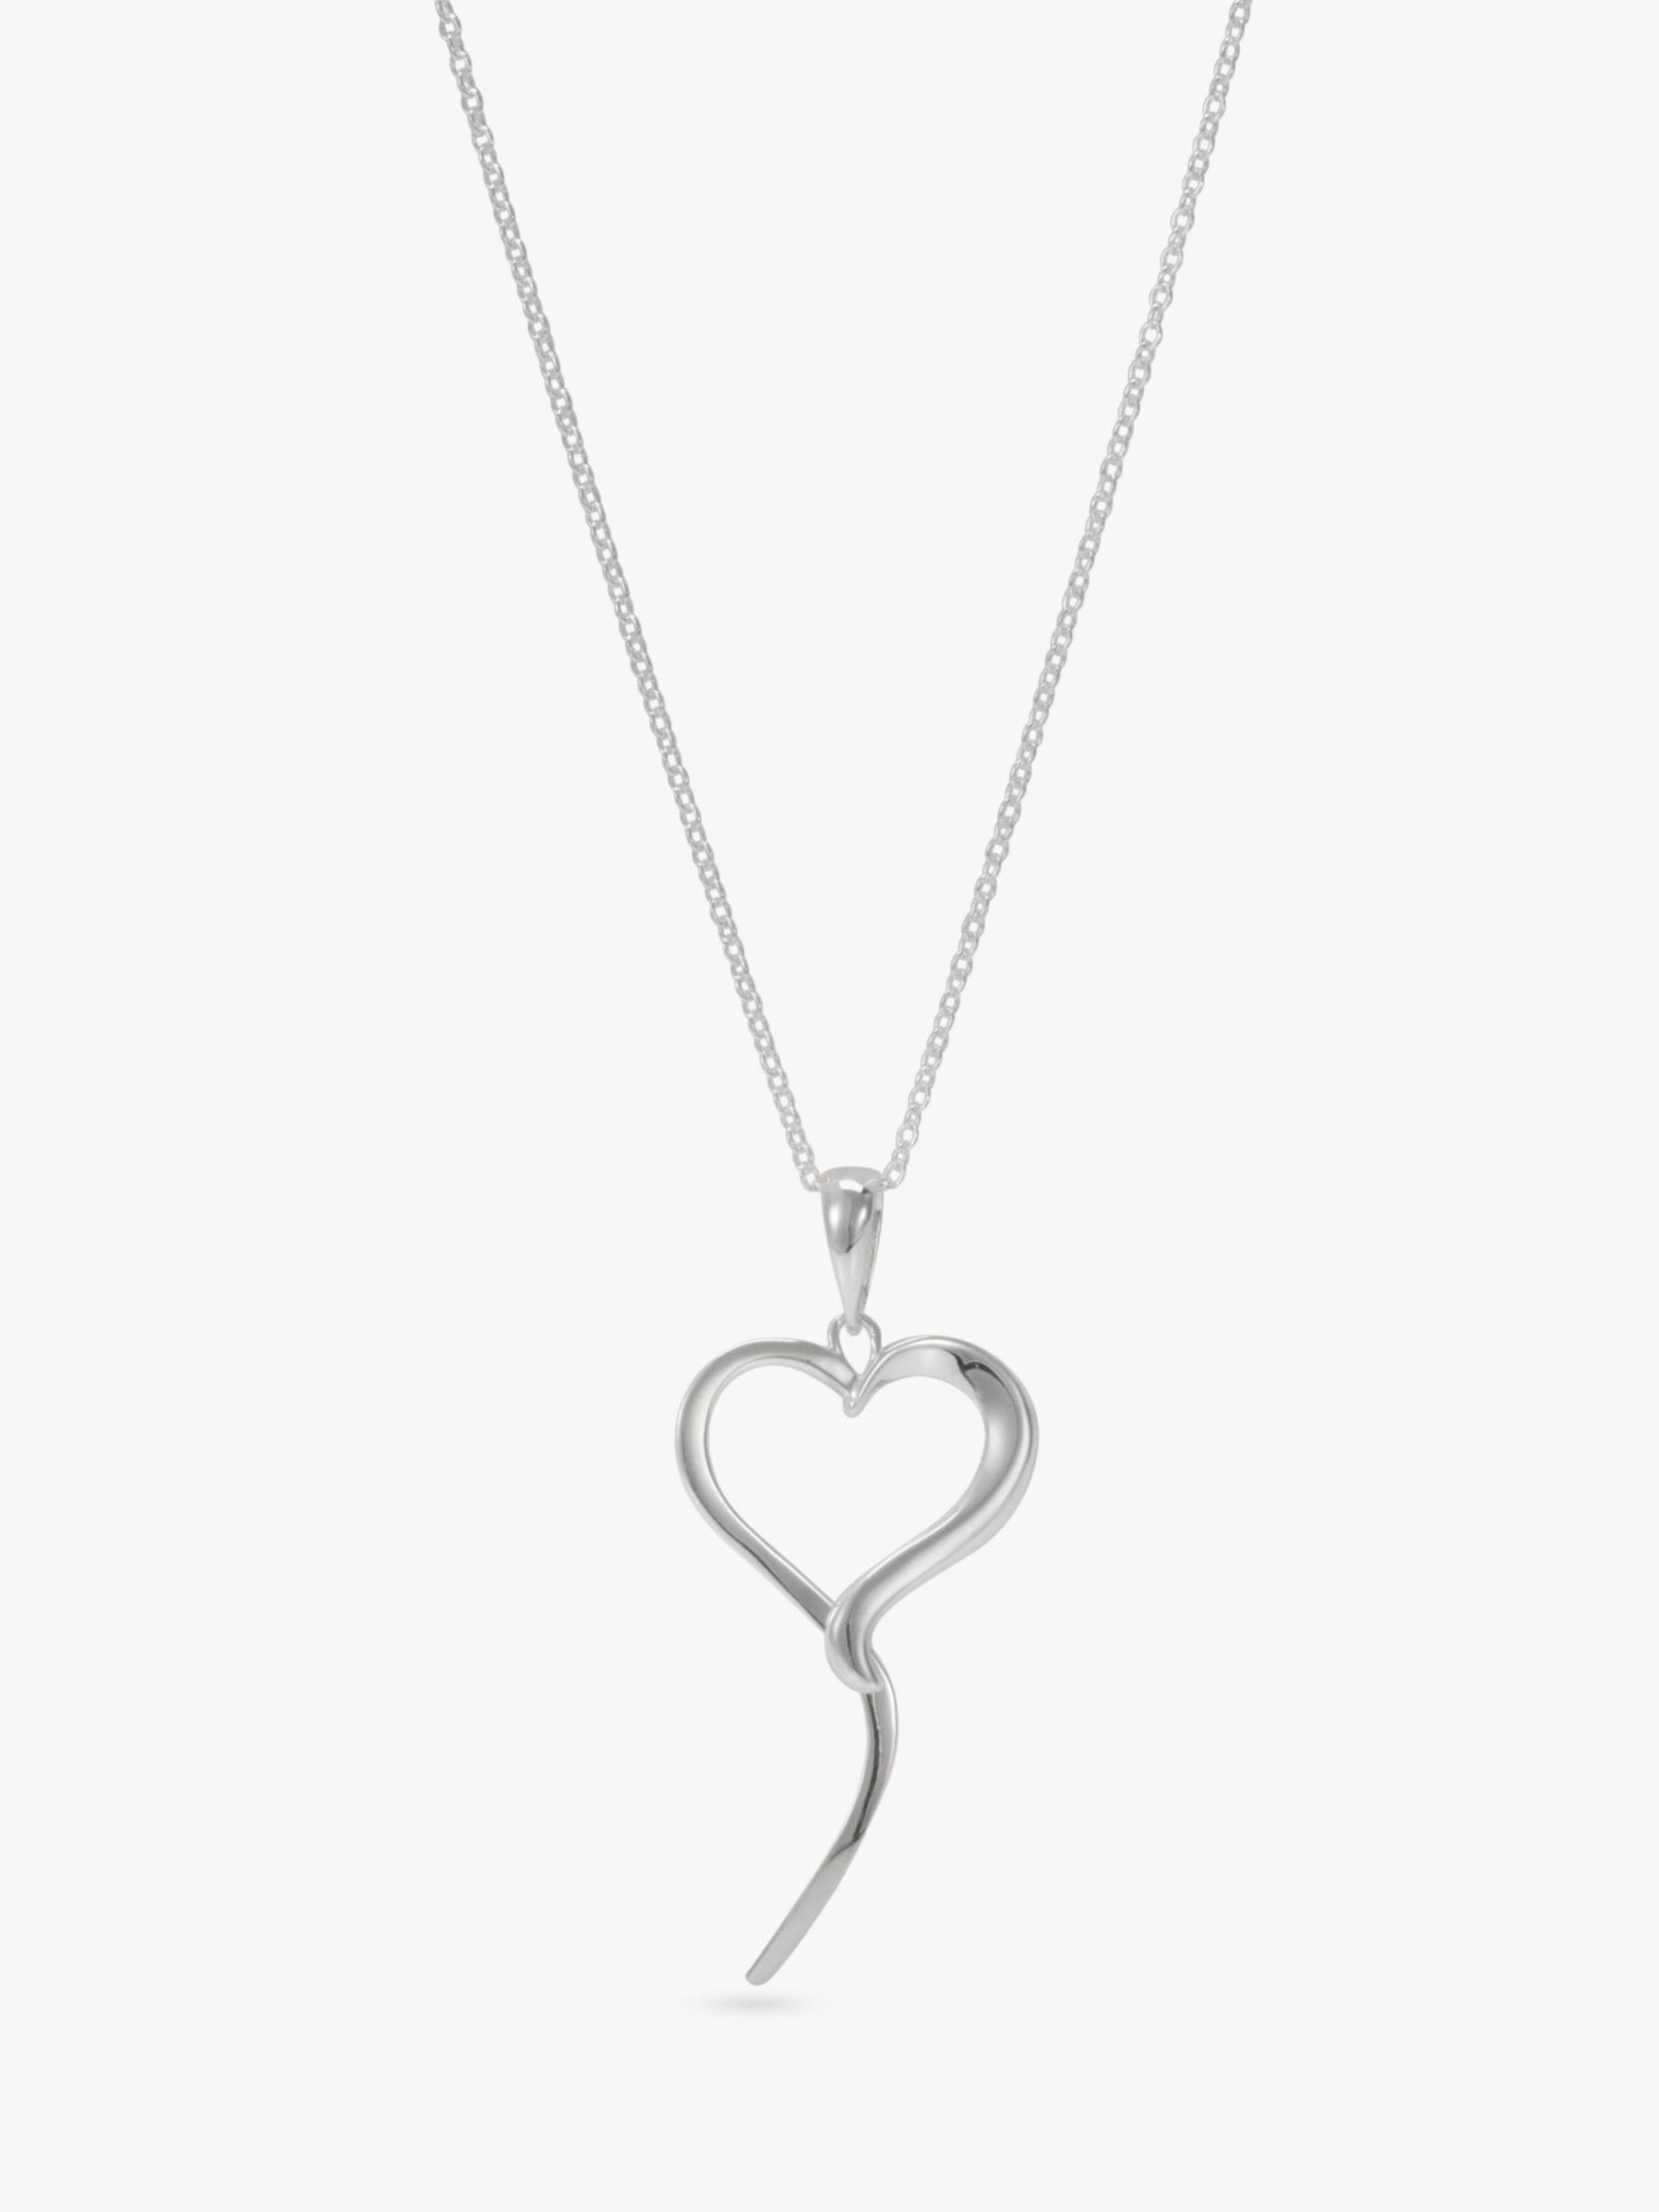 Andea Open Silver Heart Pendant Necklace